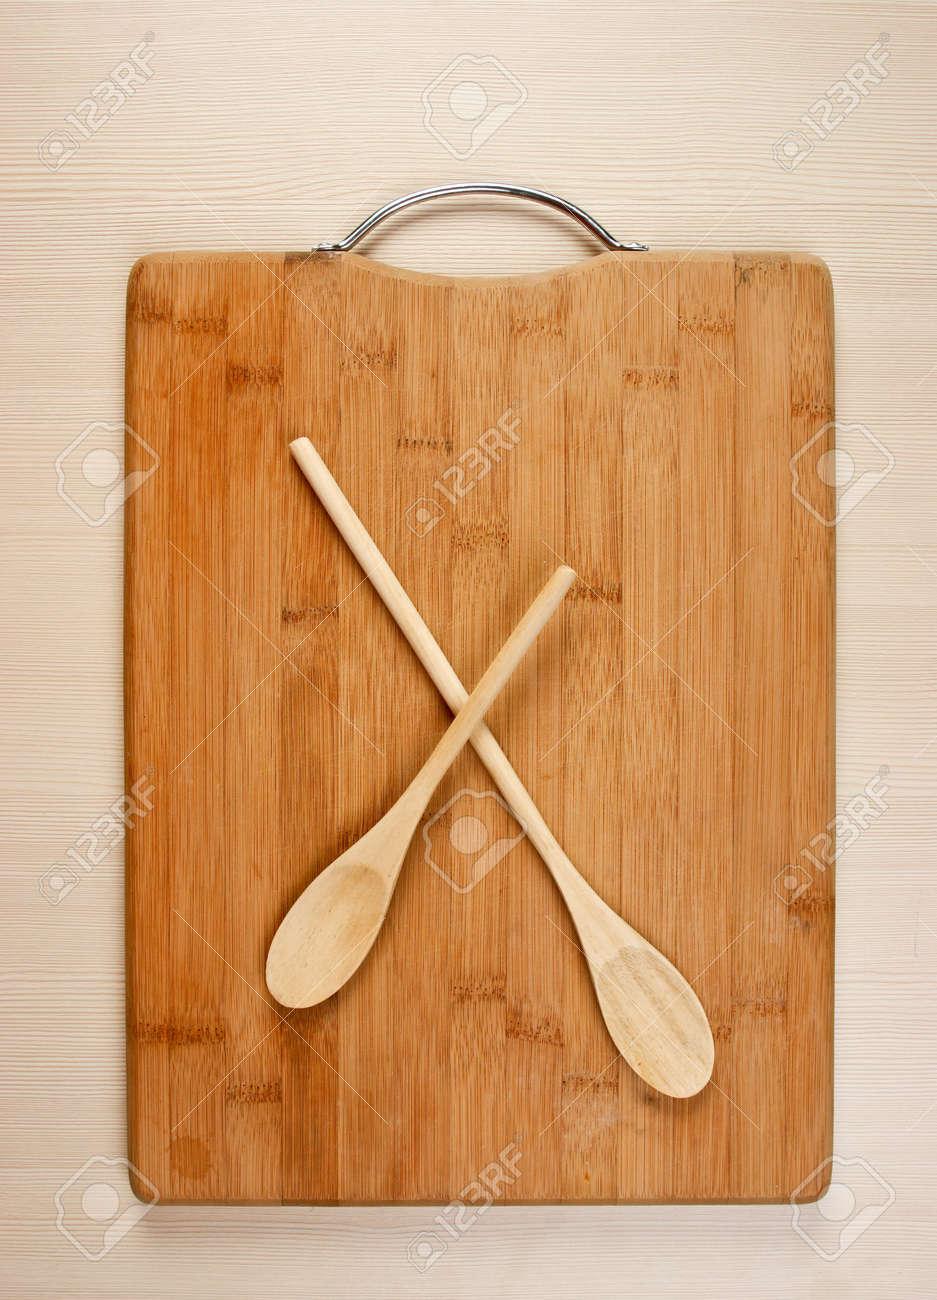 Cucchiaio di legno sul tagliere da cucina di bambù